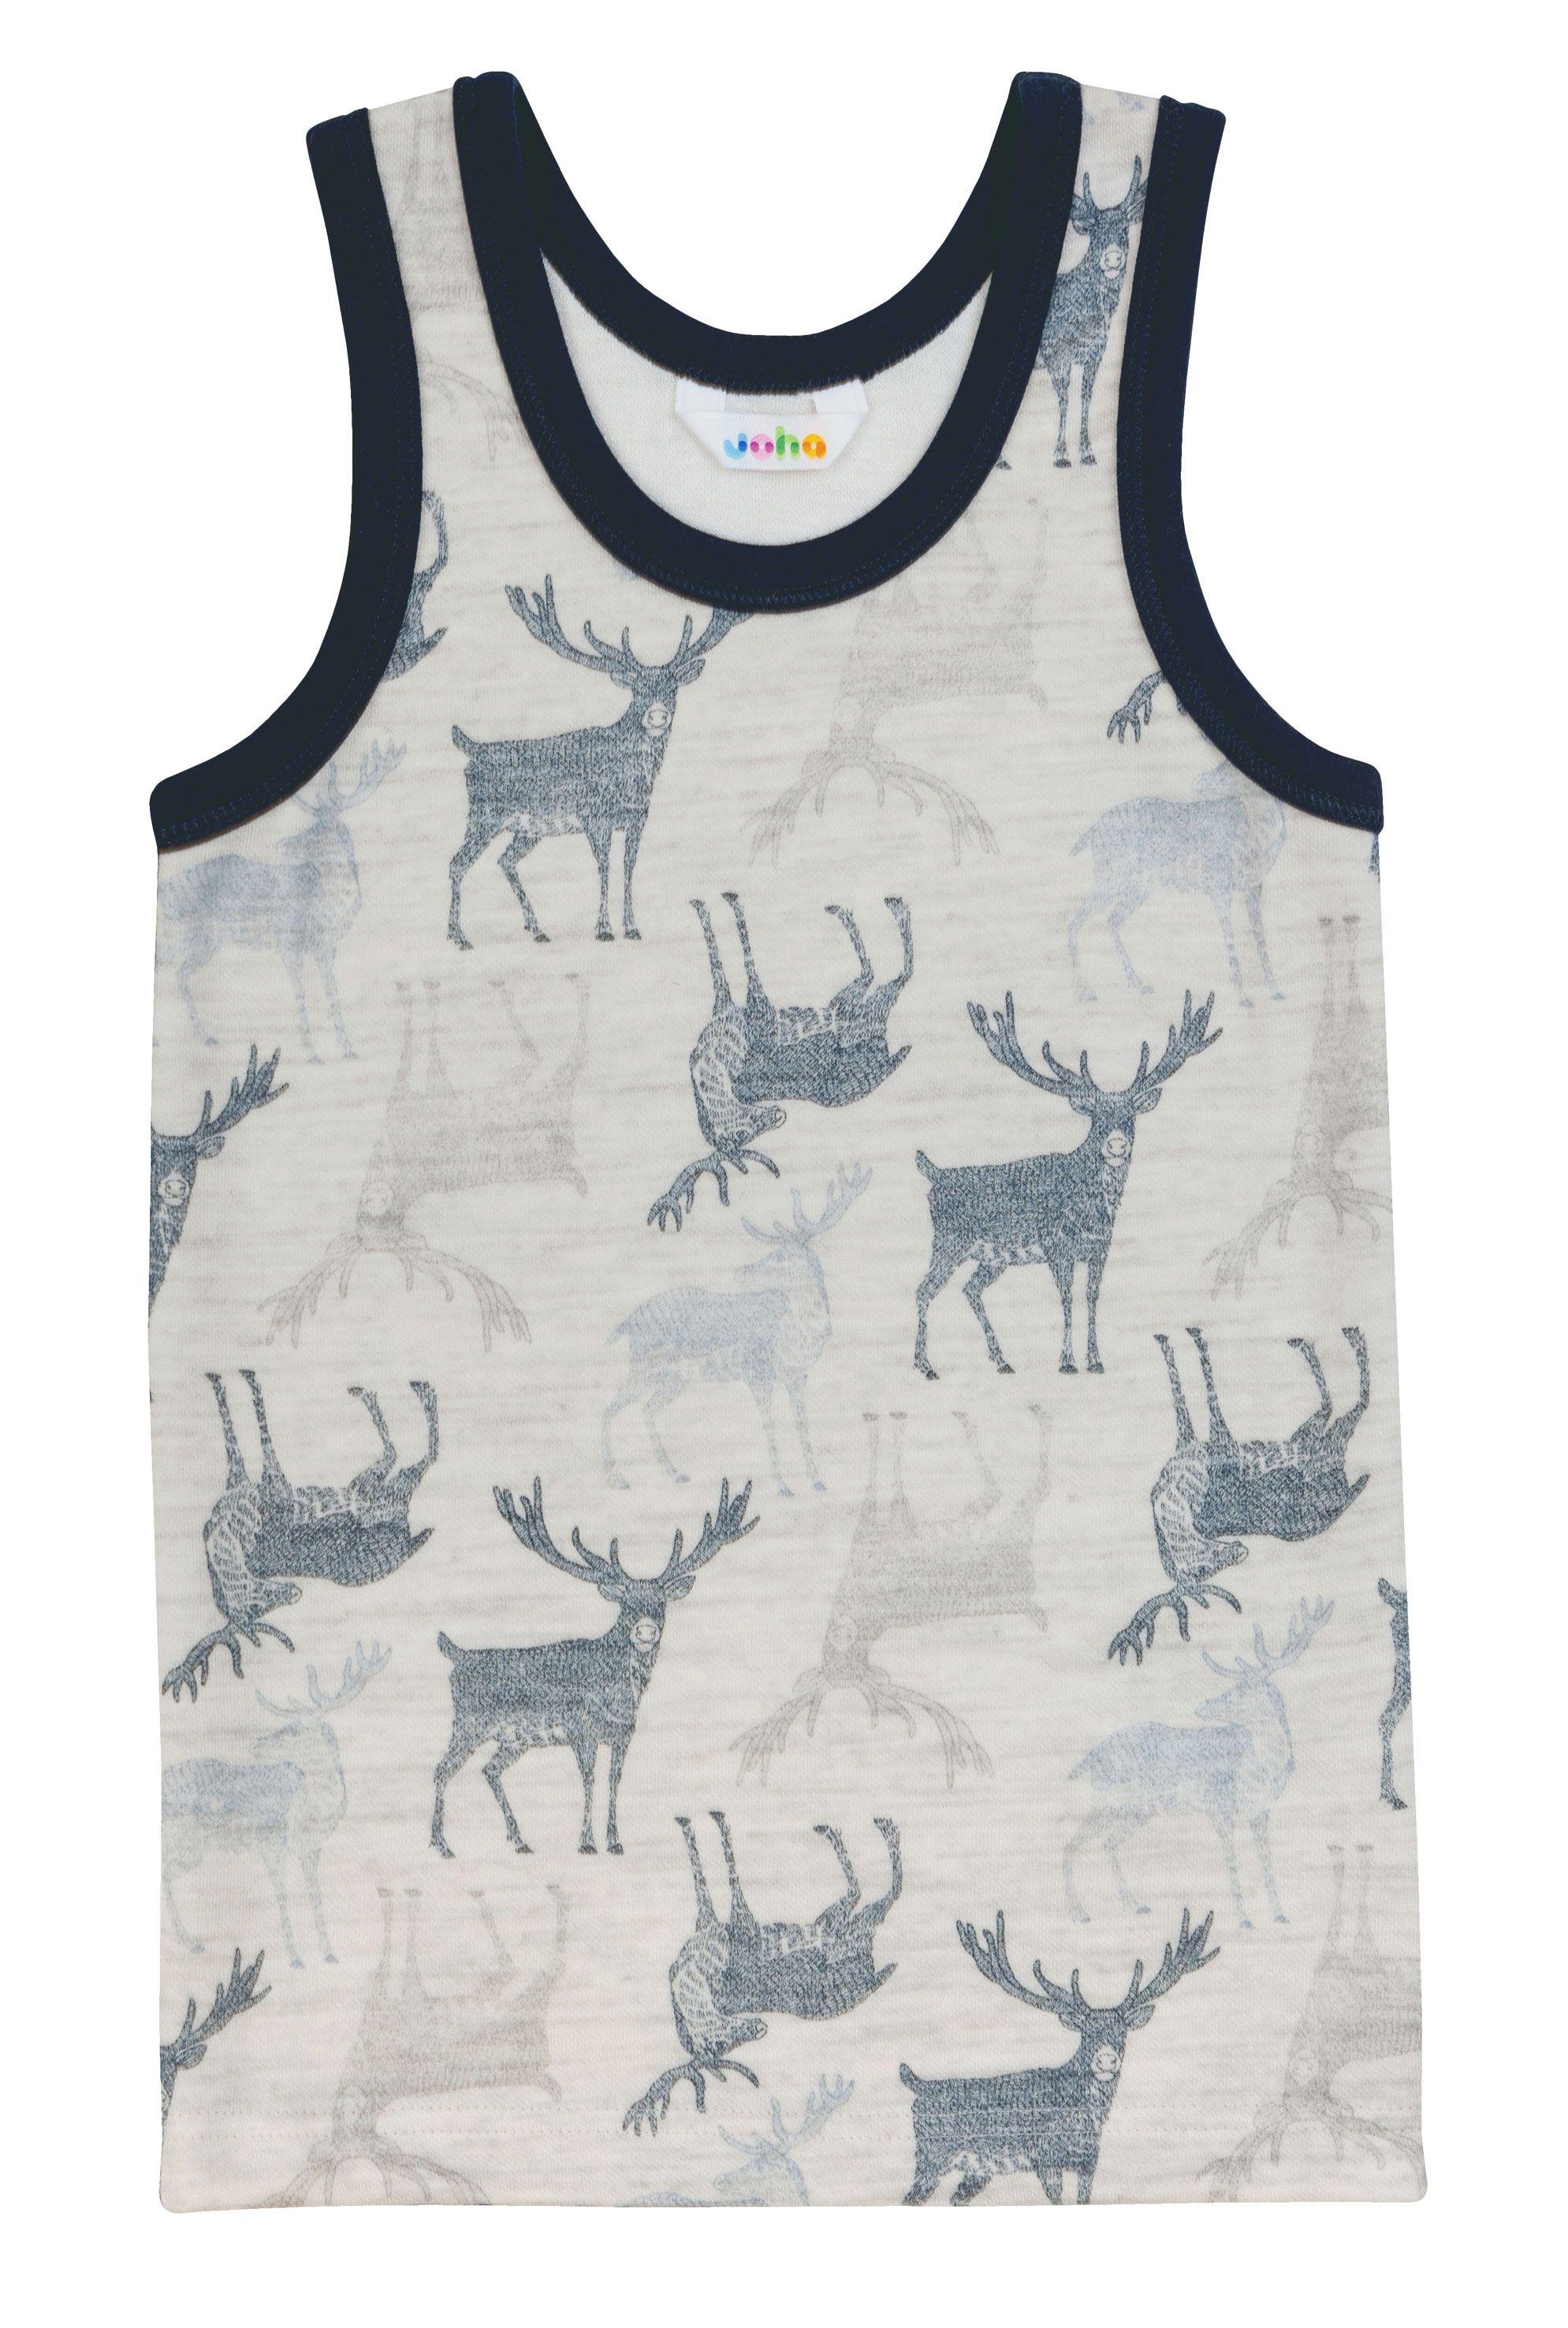 Undertrøje fra Joha i uld-bambus m. Grey-navy Deer